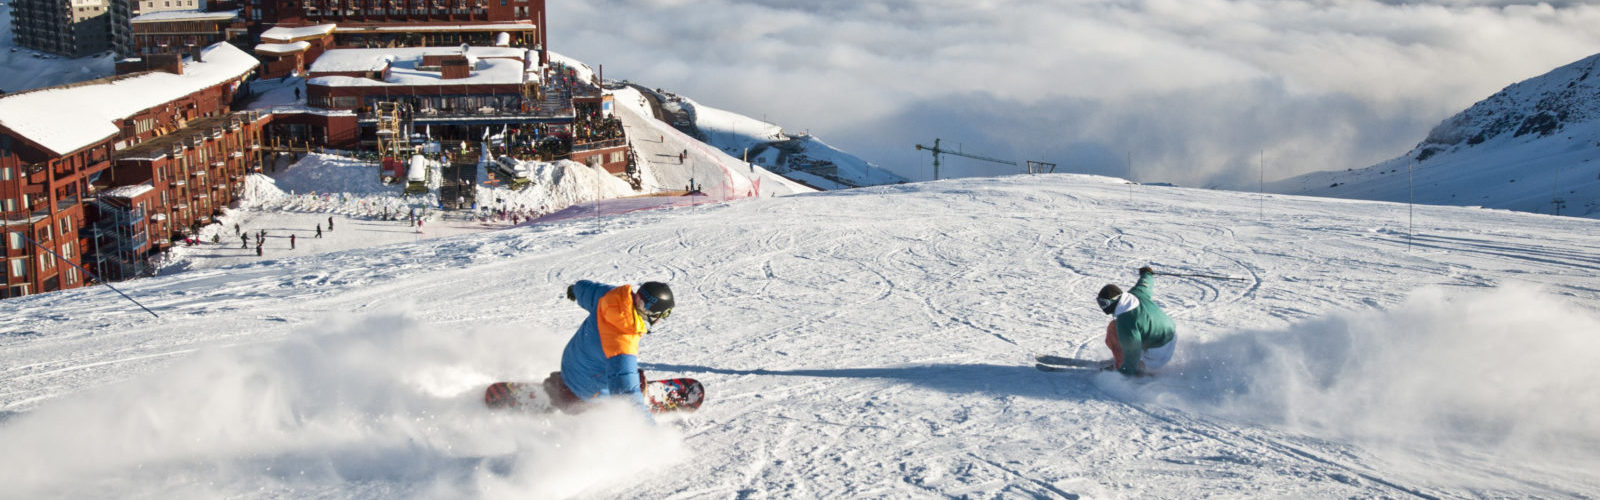 Valle Nevado skiing snow mountain